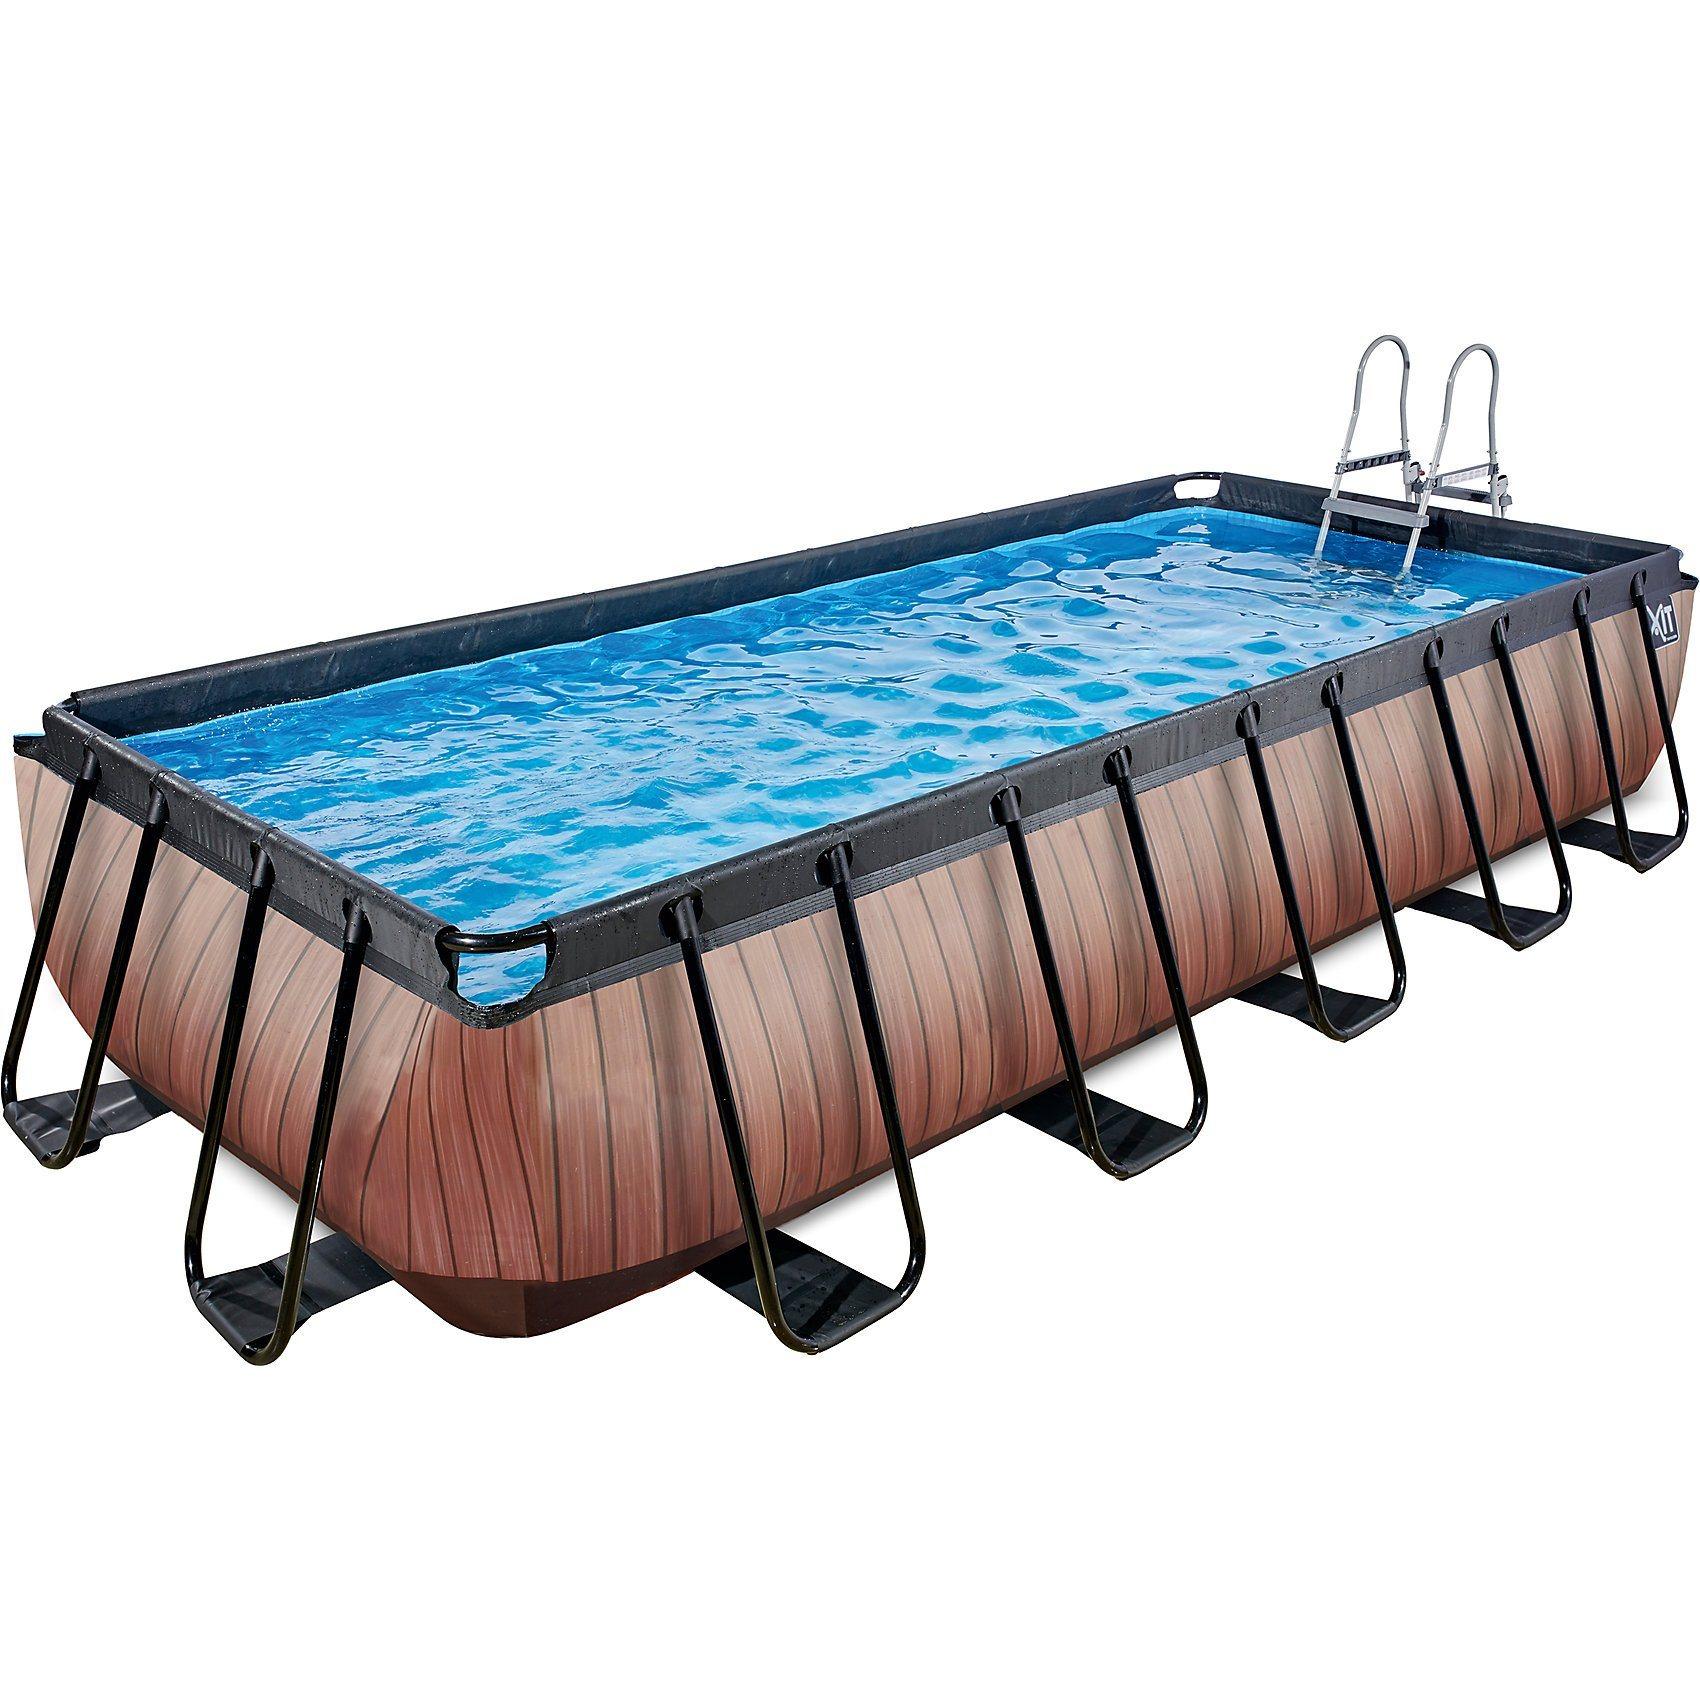 Pool frame 457x122 preisvergleich die besten angebote for Otto swimmingpool